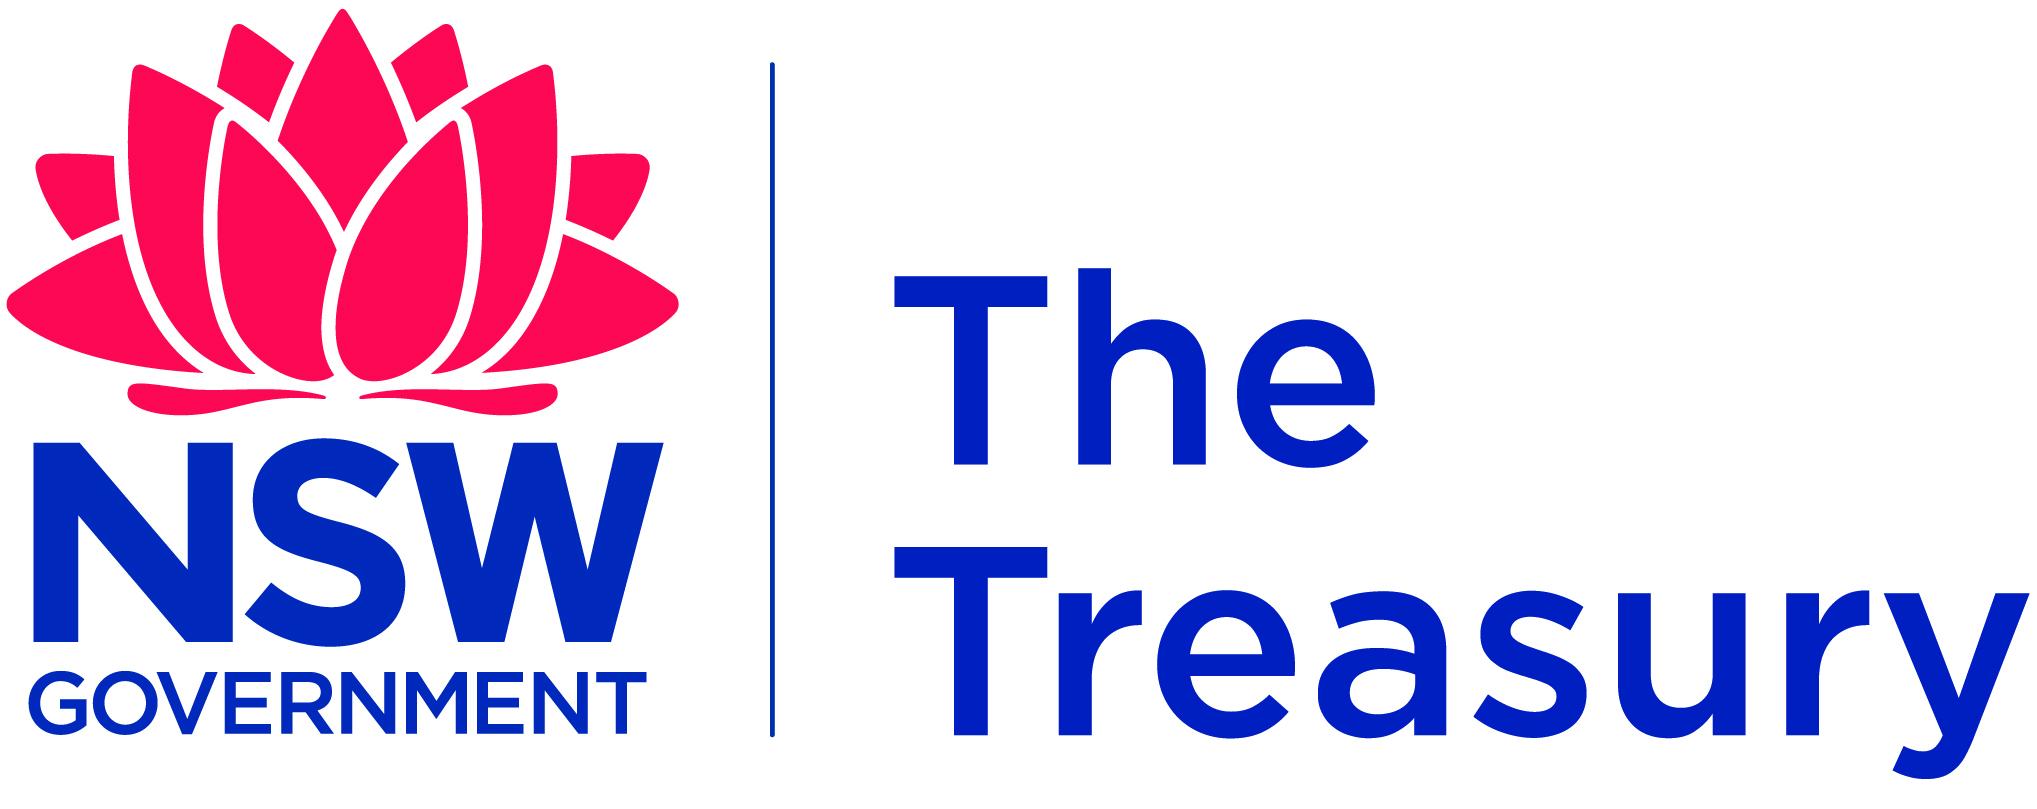 Treasury – 2 Tone_high res.jpg